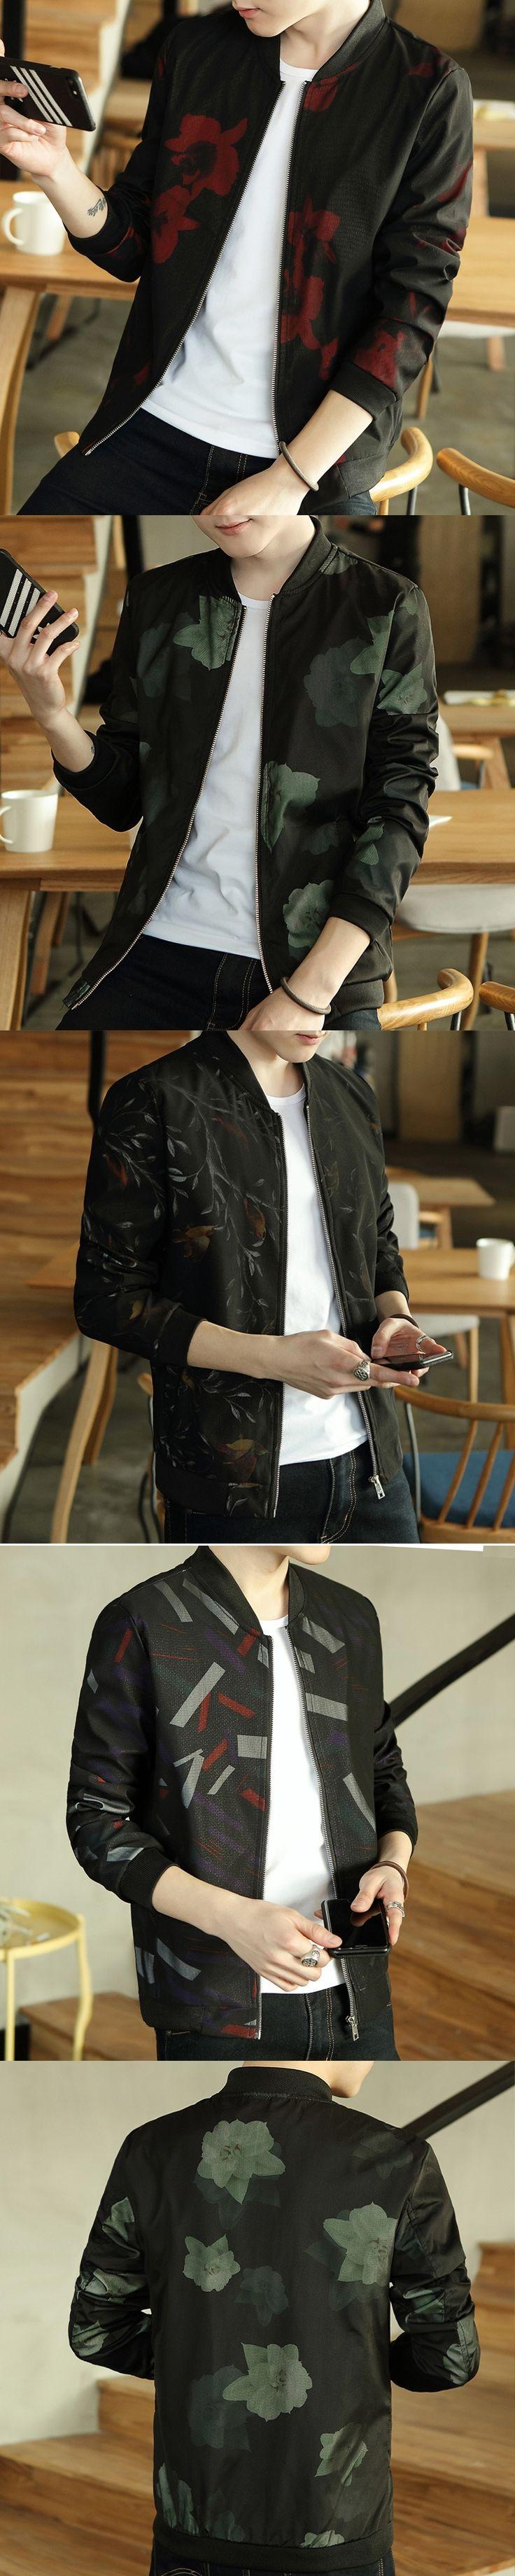 2017 Gold Printing Jacket Mens Luxury Baroque Bomber Jackets Mens Slim Fit 5XL Mens Clothing Club Outfits Royal Men Short Jacket